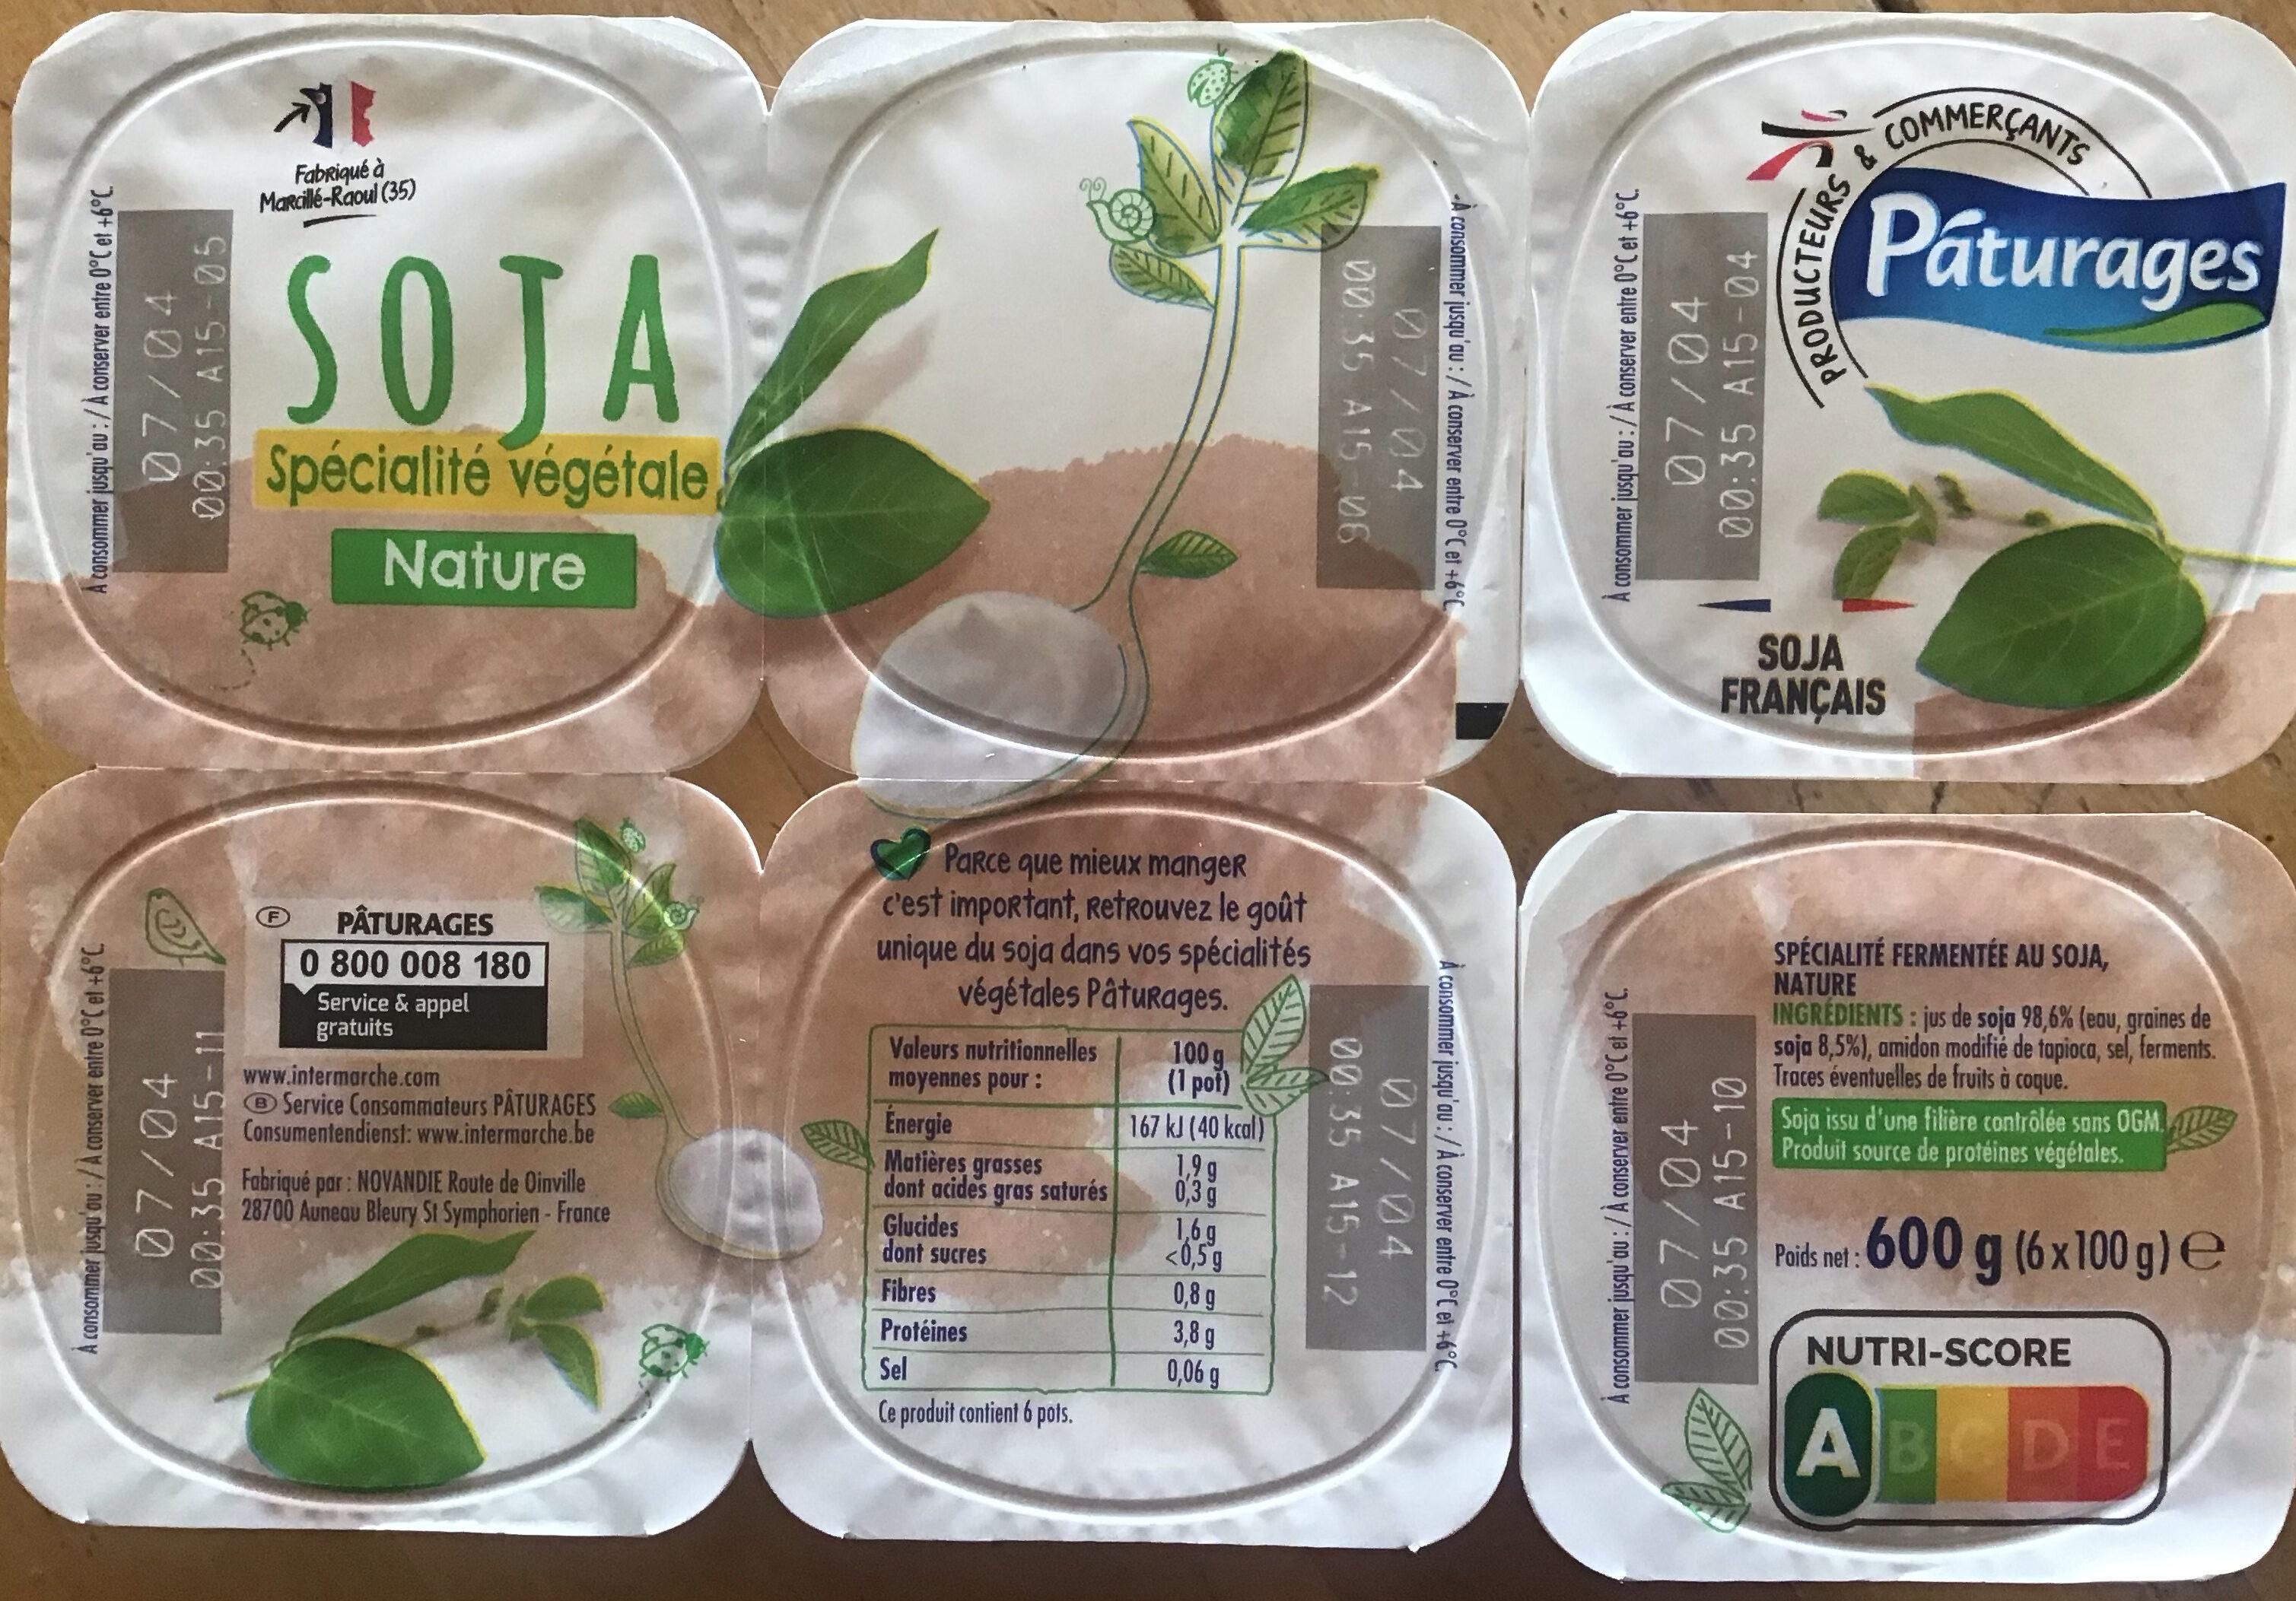 Soja nature - spécialité végétale - Prodotto - fr